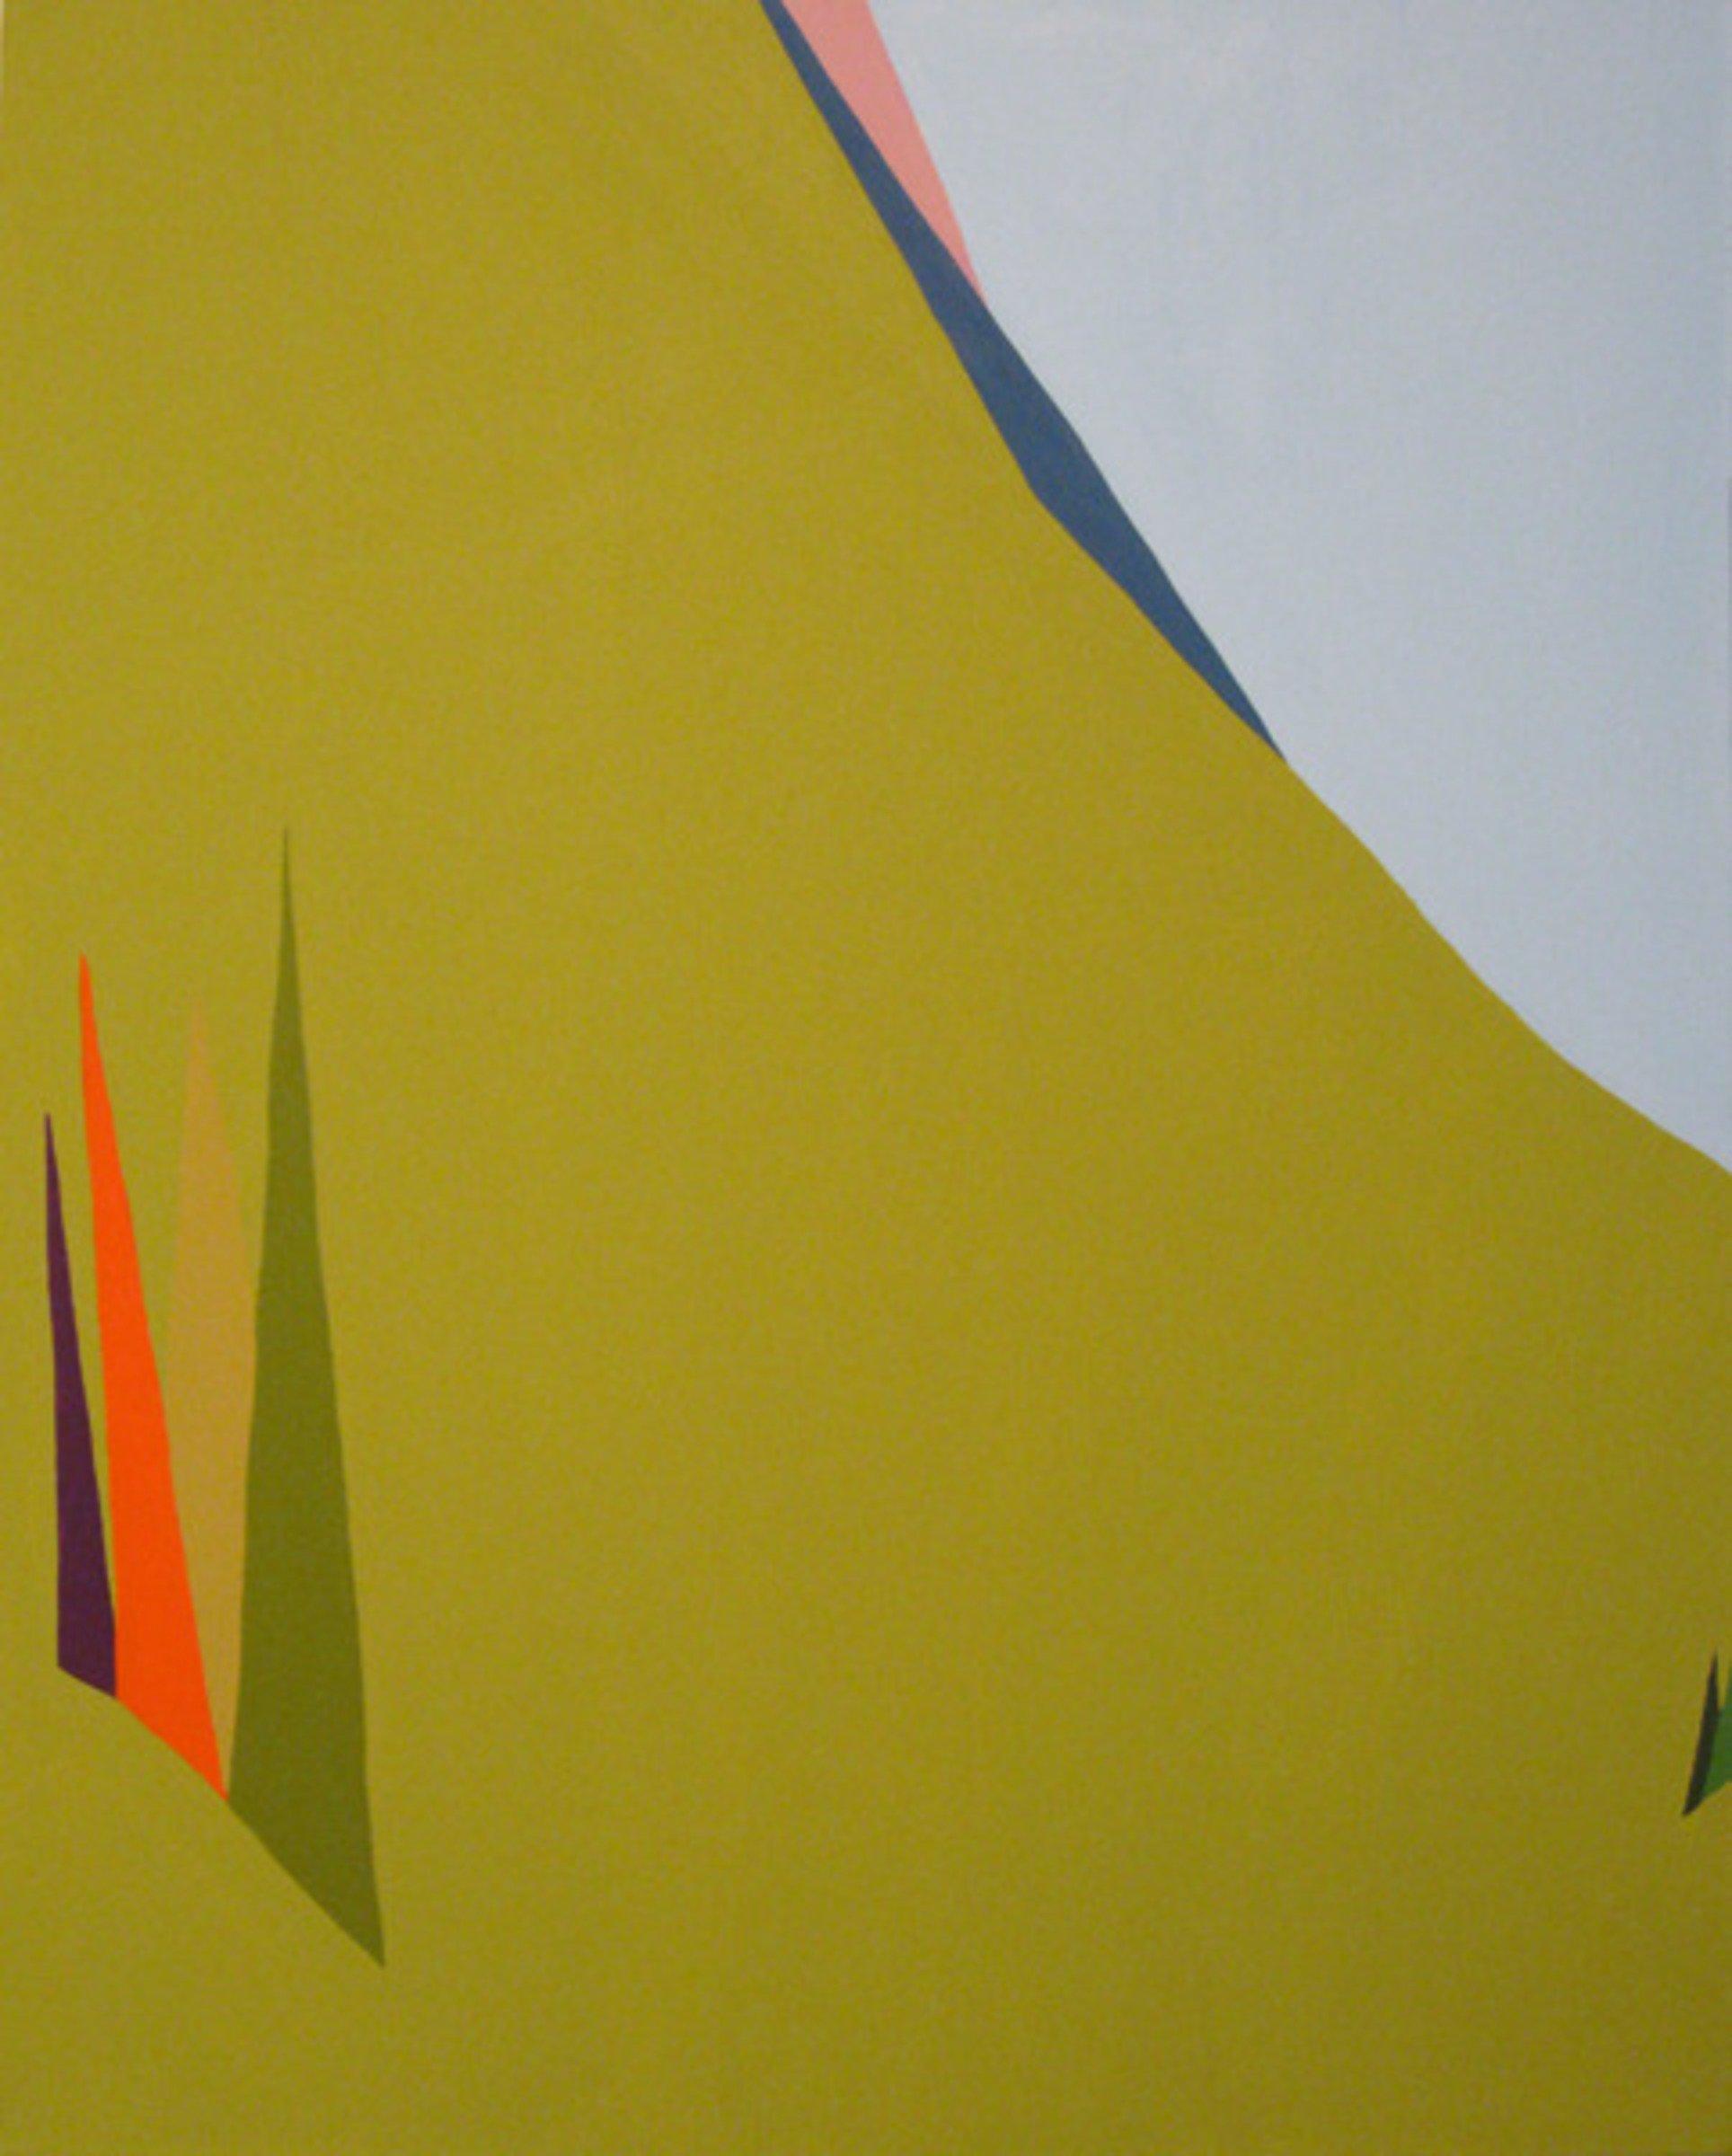 Patty Cateura, Fall Mntn, 2010